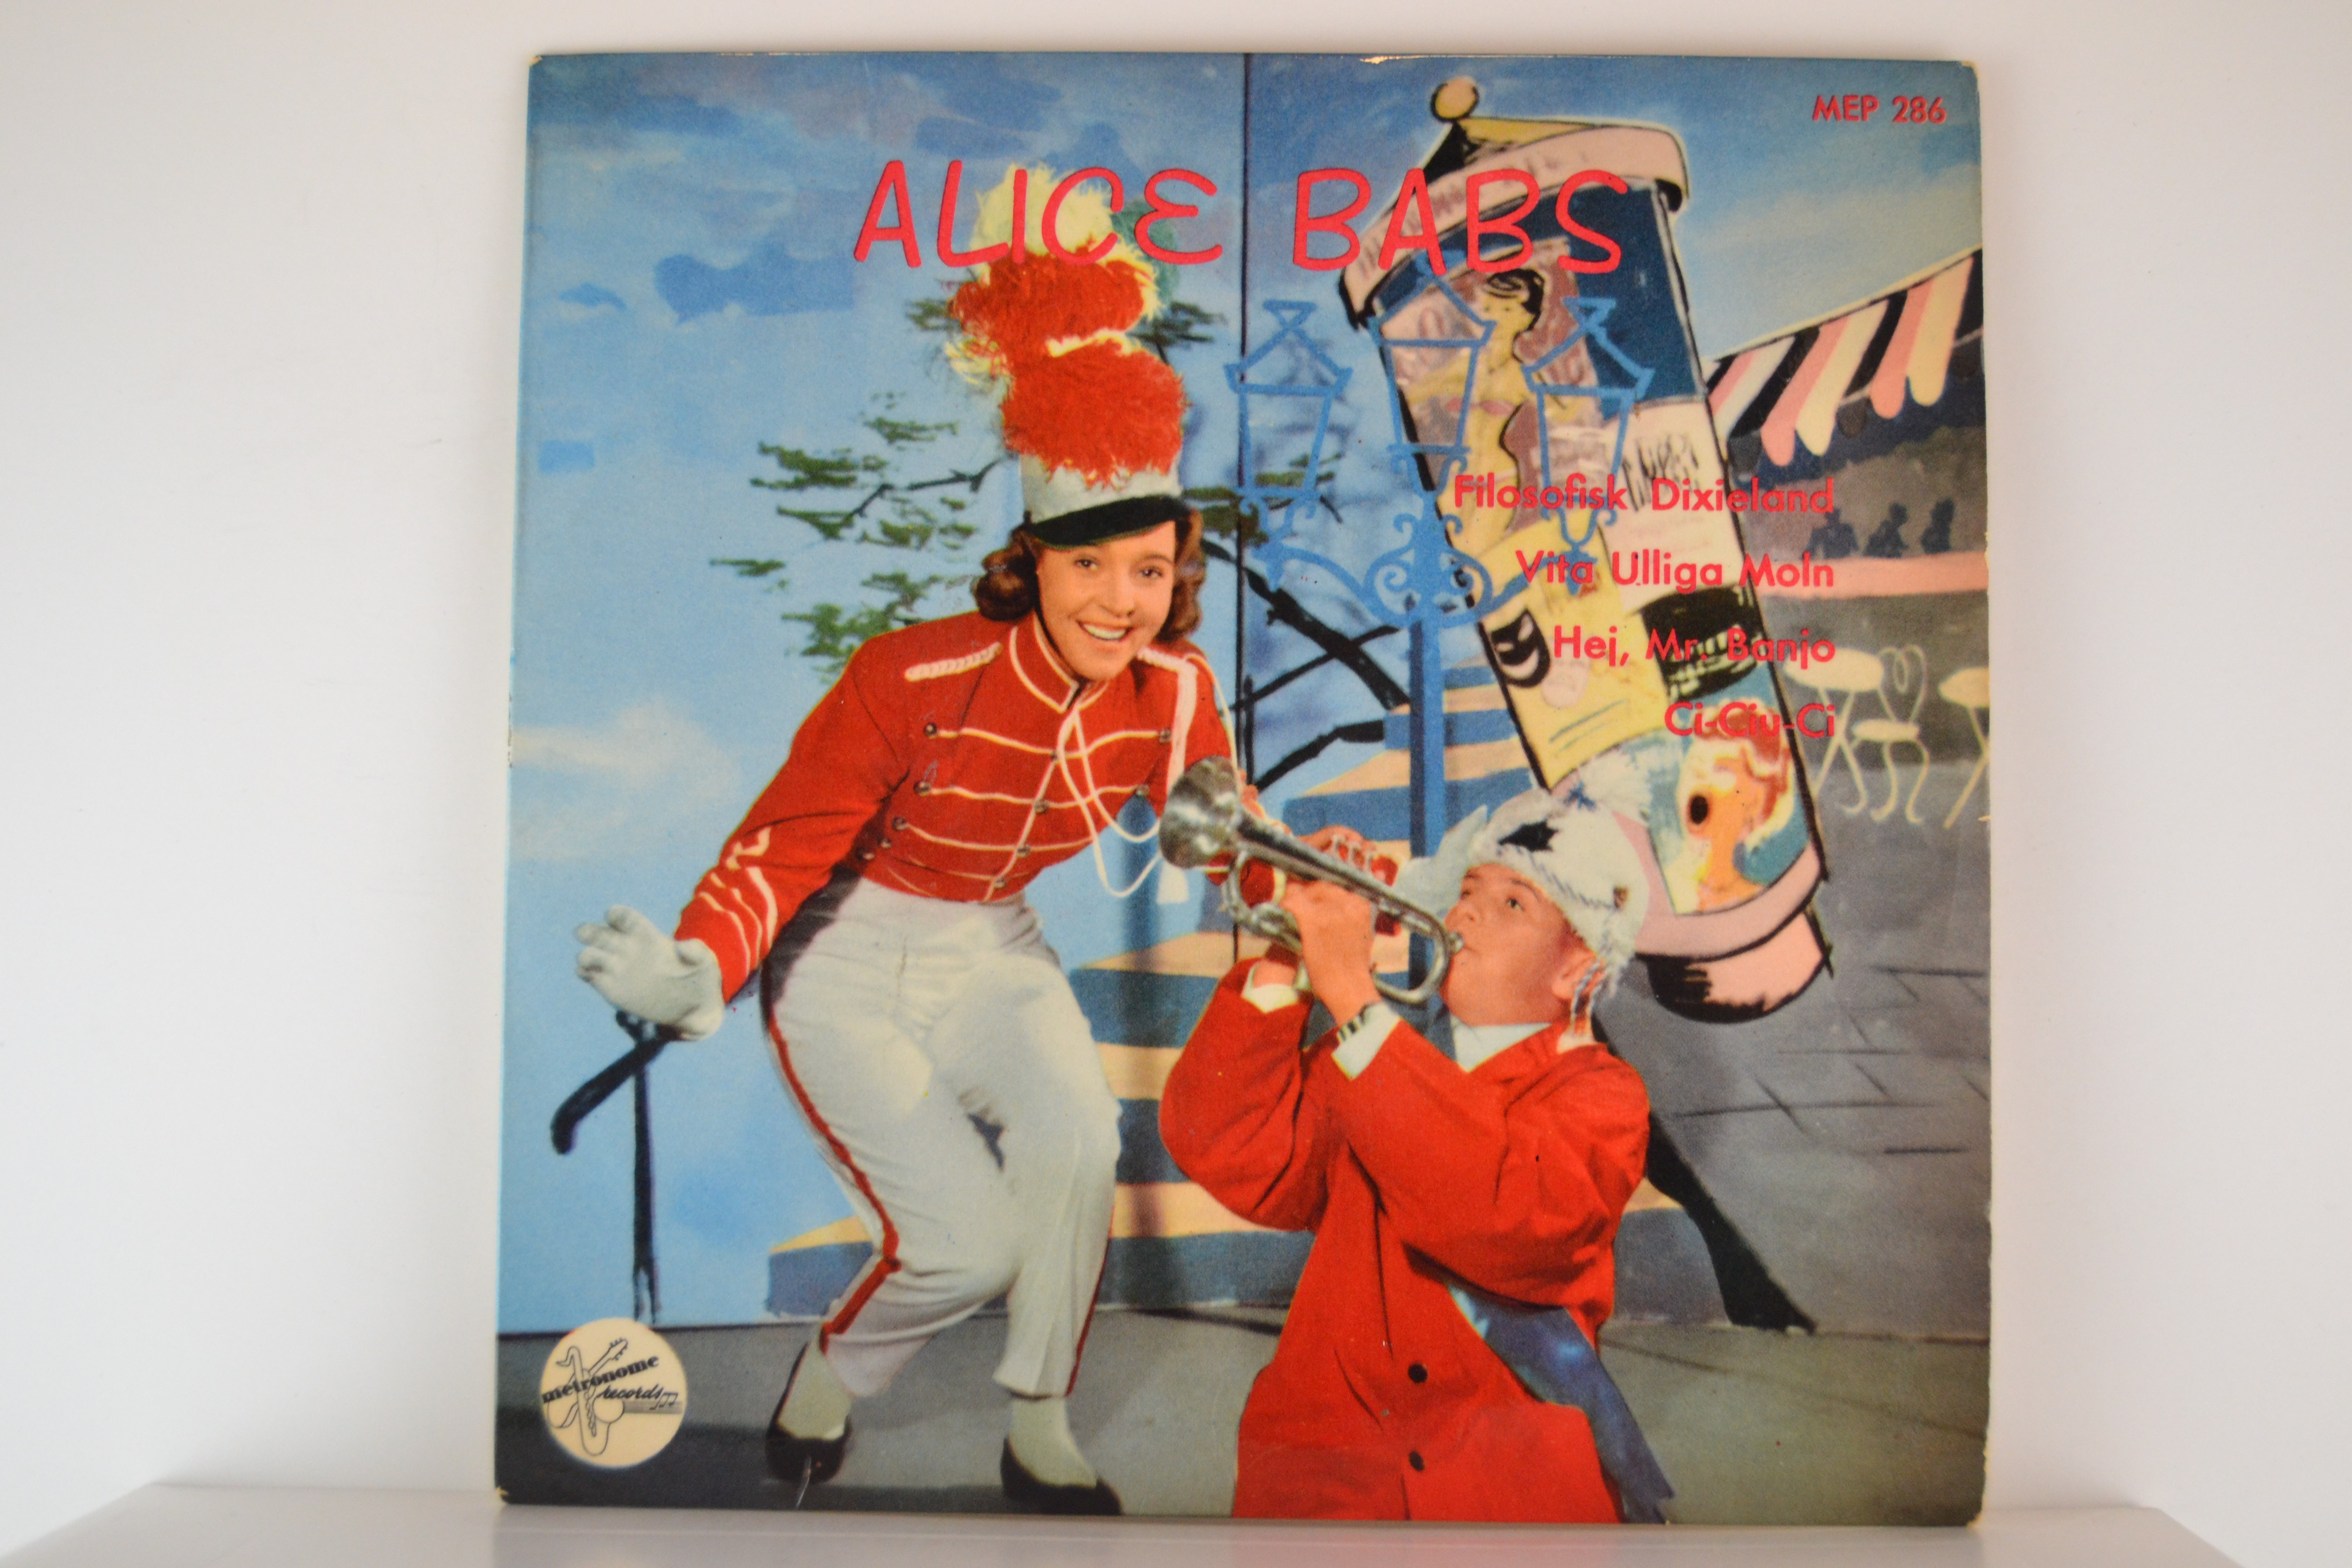 ALICE BABS : (EP) Filosofisk Dixieland / Vita ulliga moln / Hej Mr. Banjo / Ci-ciu-ci